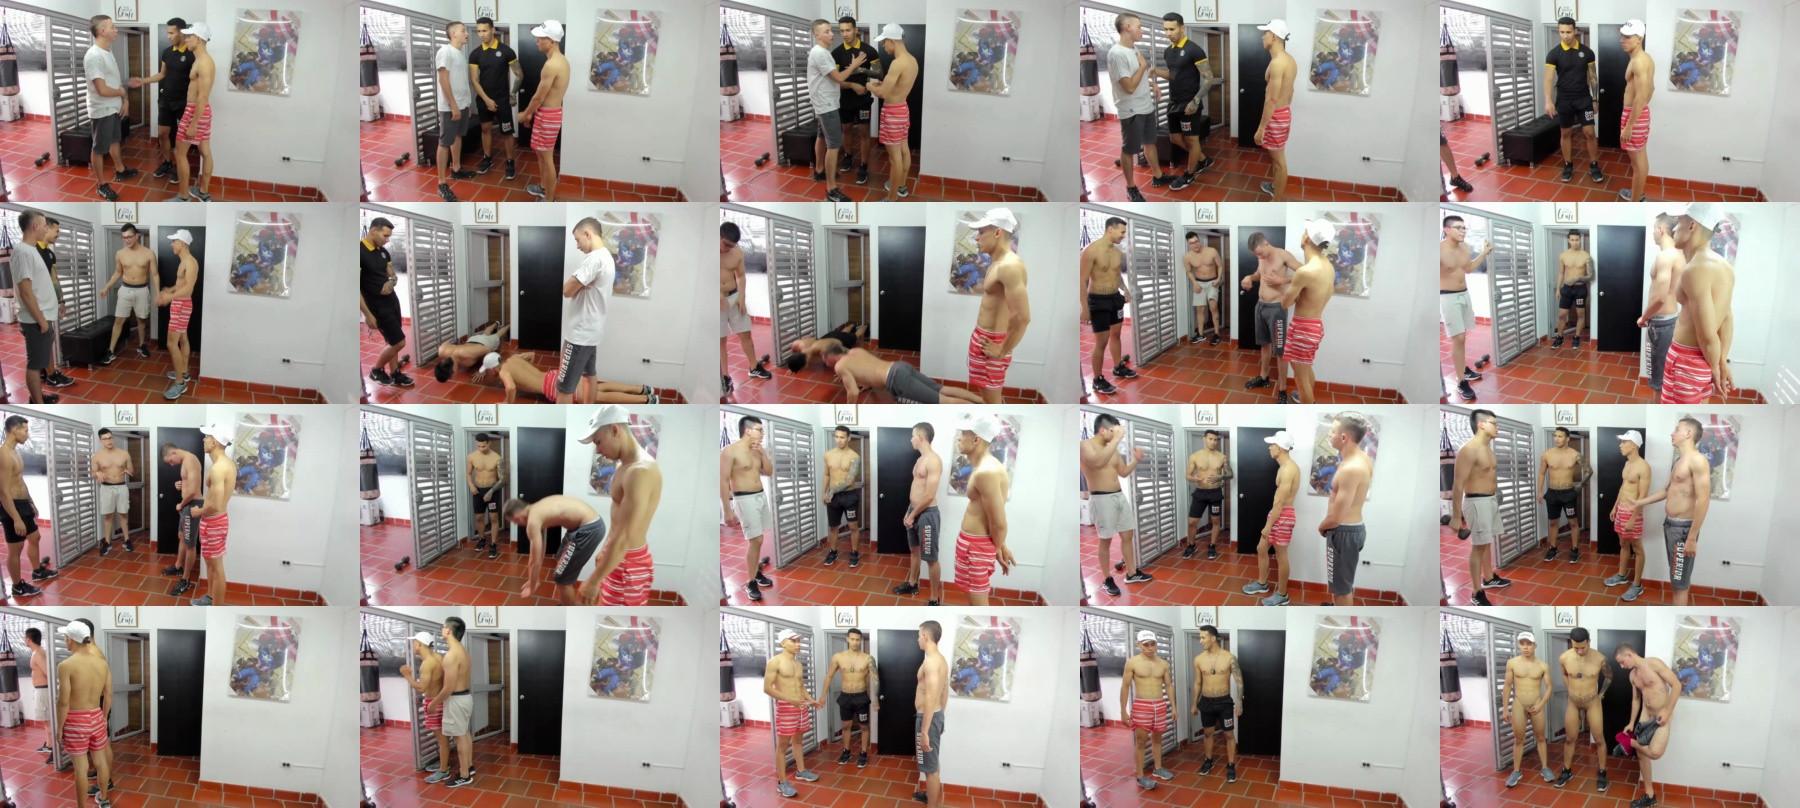 Badguys_Sex Ass CAM SHOW @ Chaturbate 10-03-2021